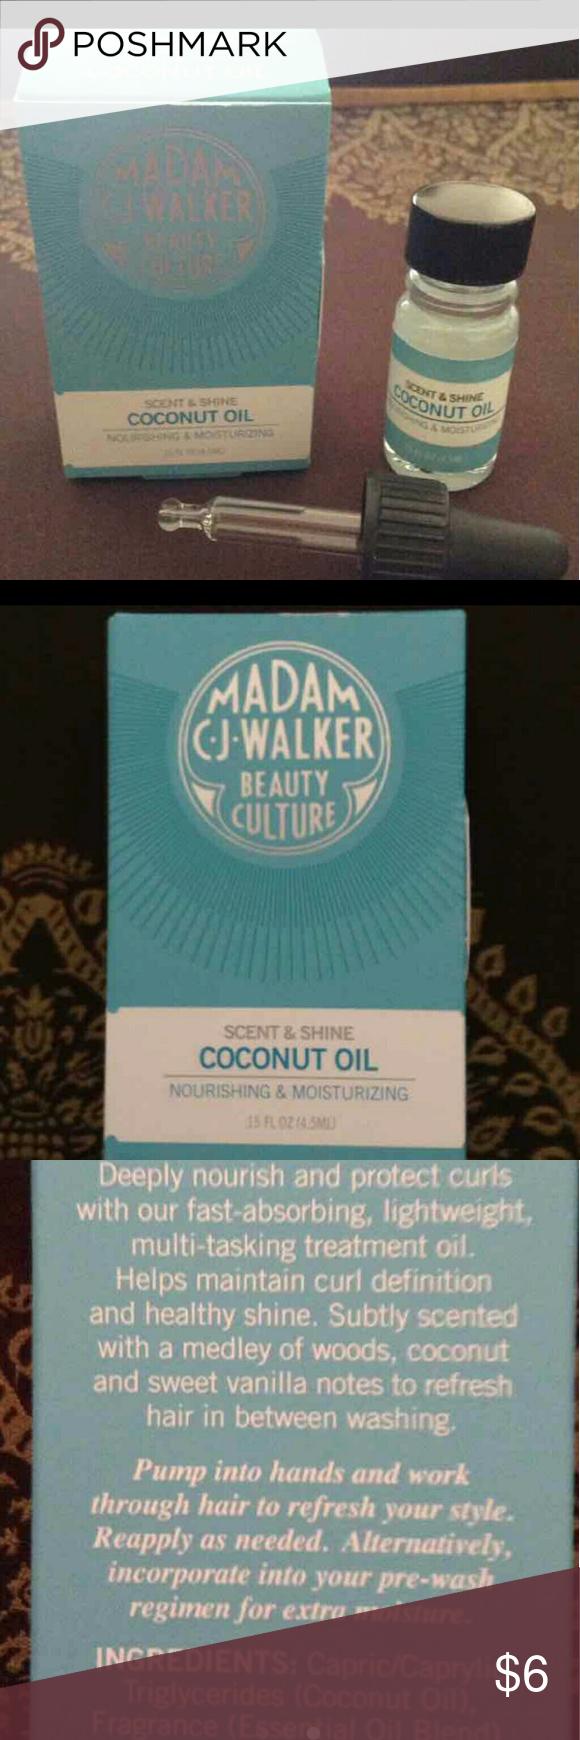 Madam CJ Walker Coconut Hair Oil Madam CJ Walker Beauty